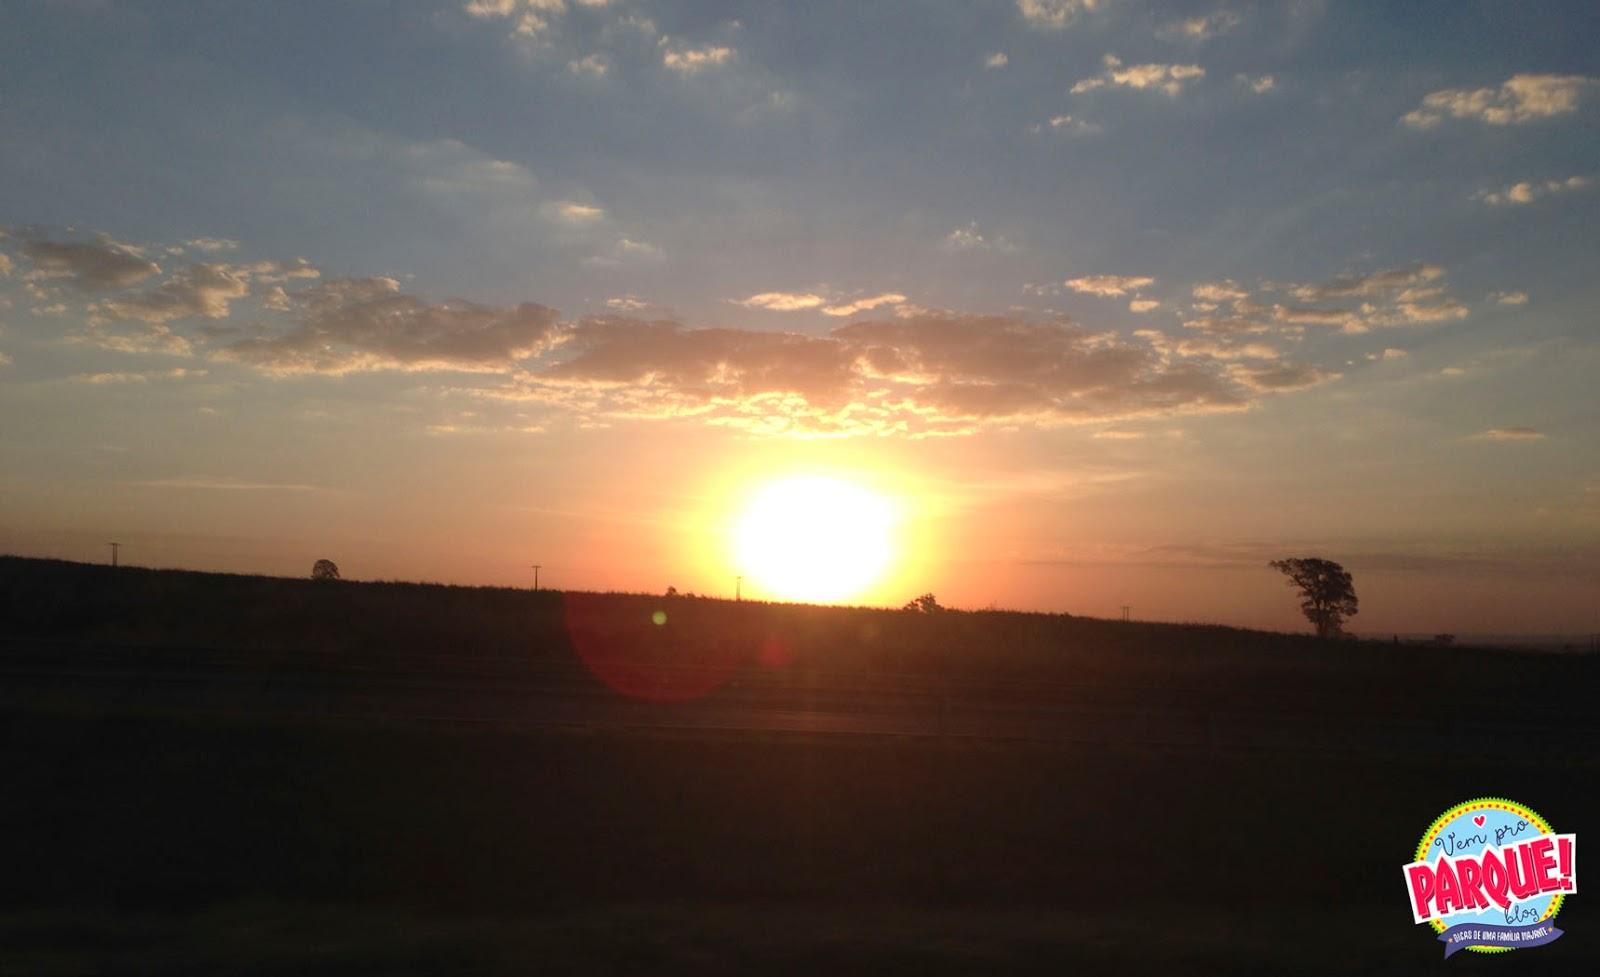 Pôr do Sol lindo de viver na estrada rumo à Uberaba